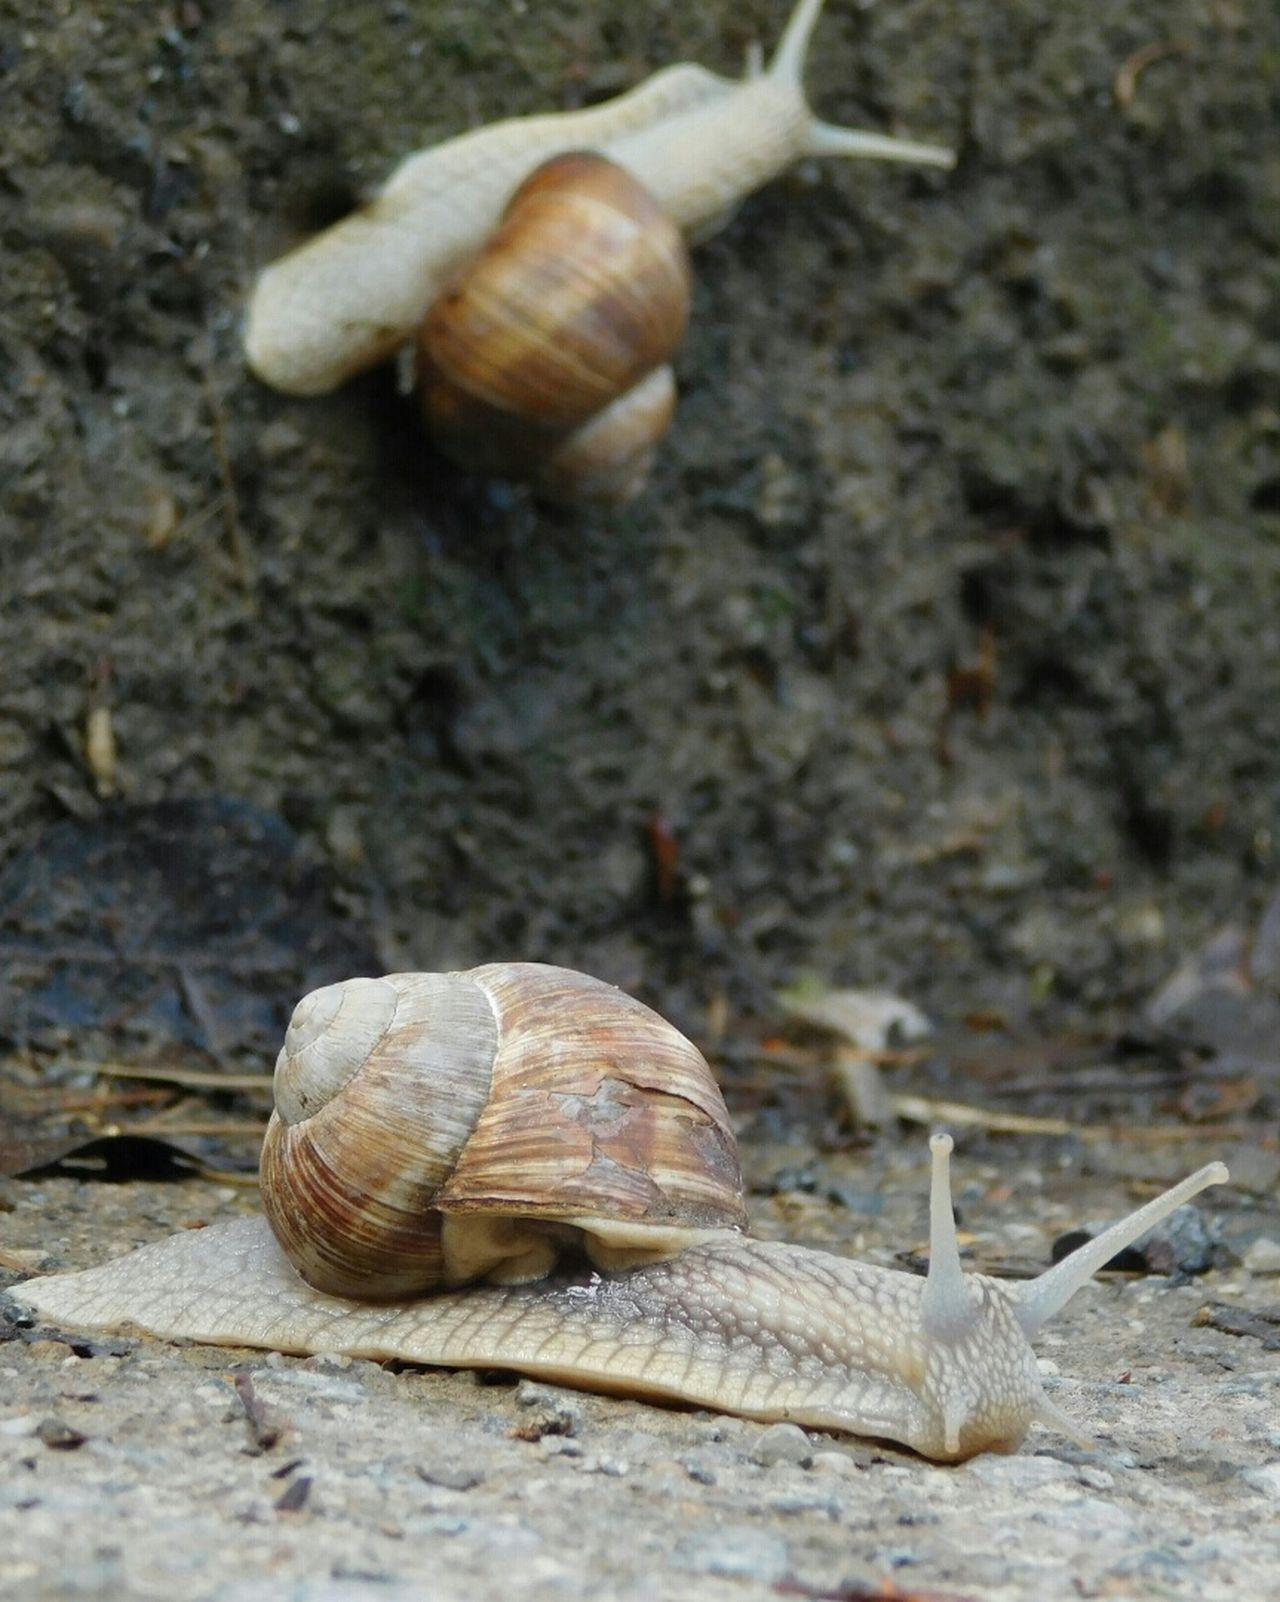 Snail Animal Shell Animal Themes Gastropod Animals In The Wild Animal Wildlife Close-up Outdoors Nature Sea Life Sand Macro Photography Macro Beauty Macro Nature Macrophotography Macro_captures Oradea,România